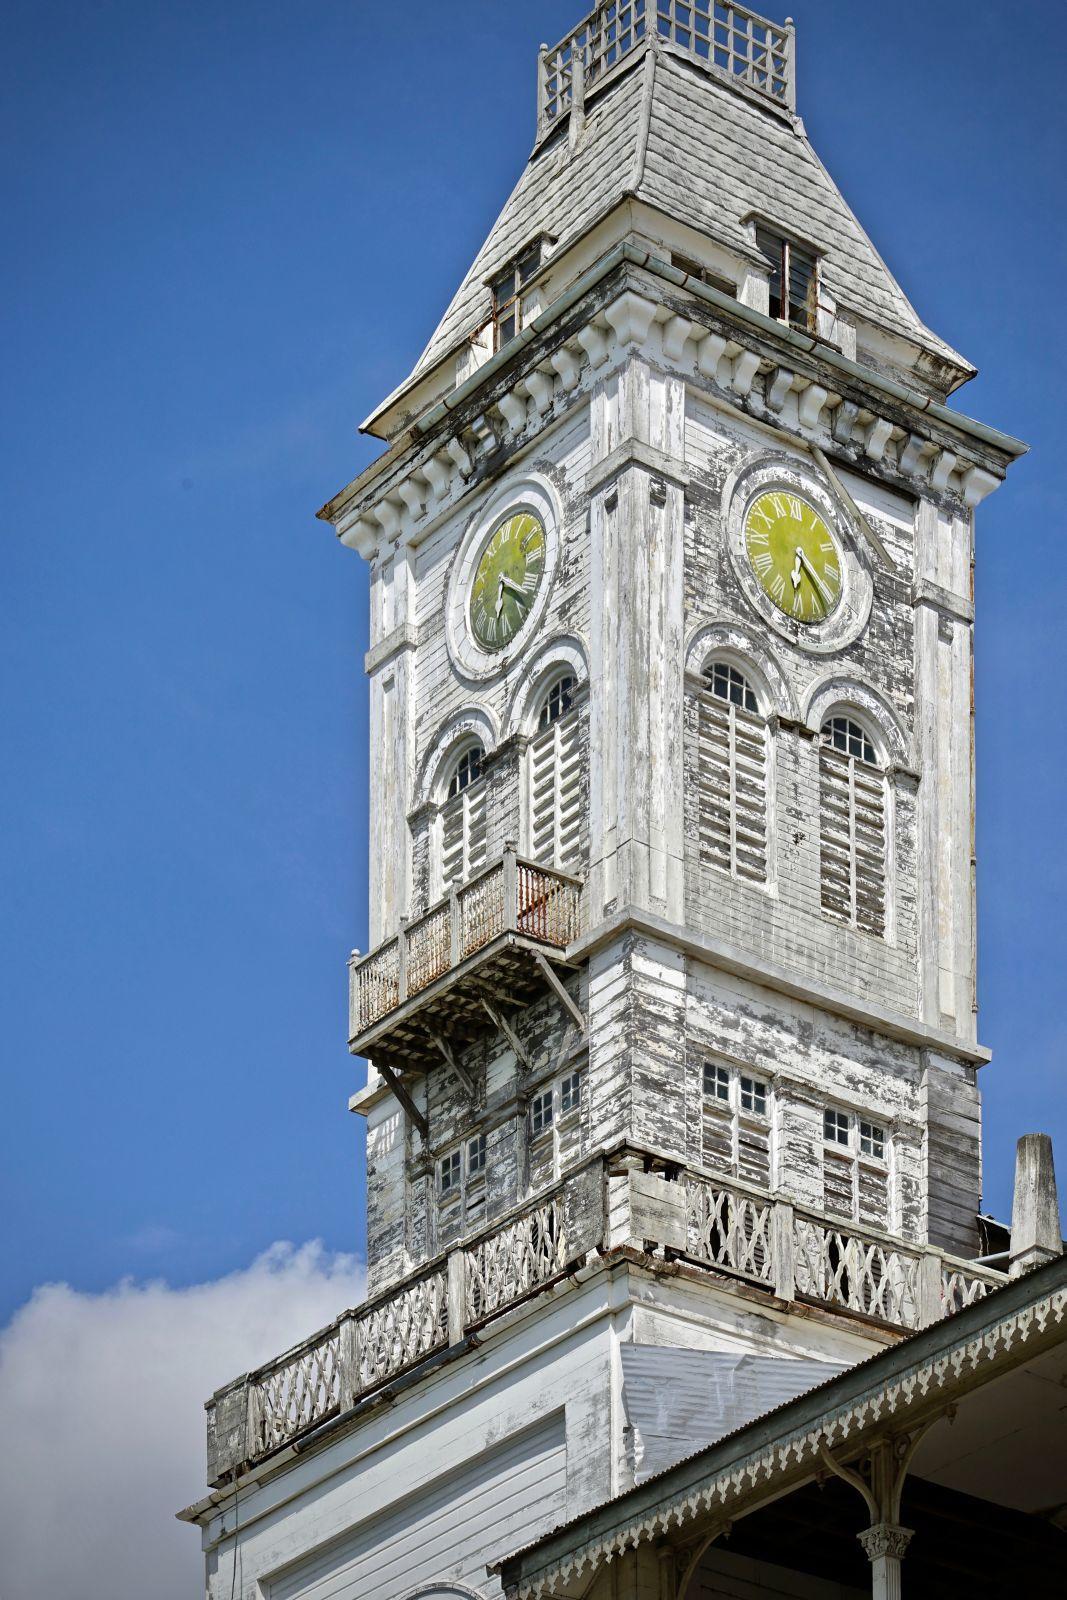 Markanter Hingucker: Der Uhrenturm des House of Wonders in Stone Town.